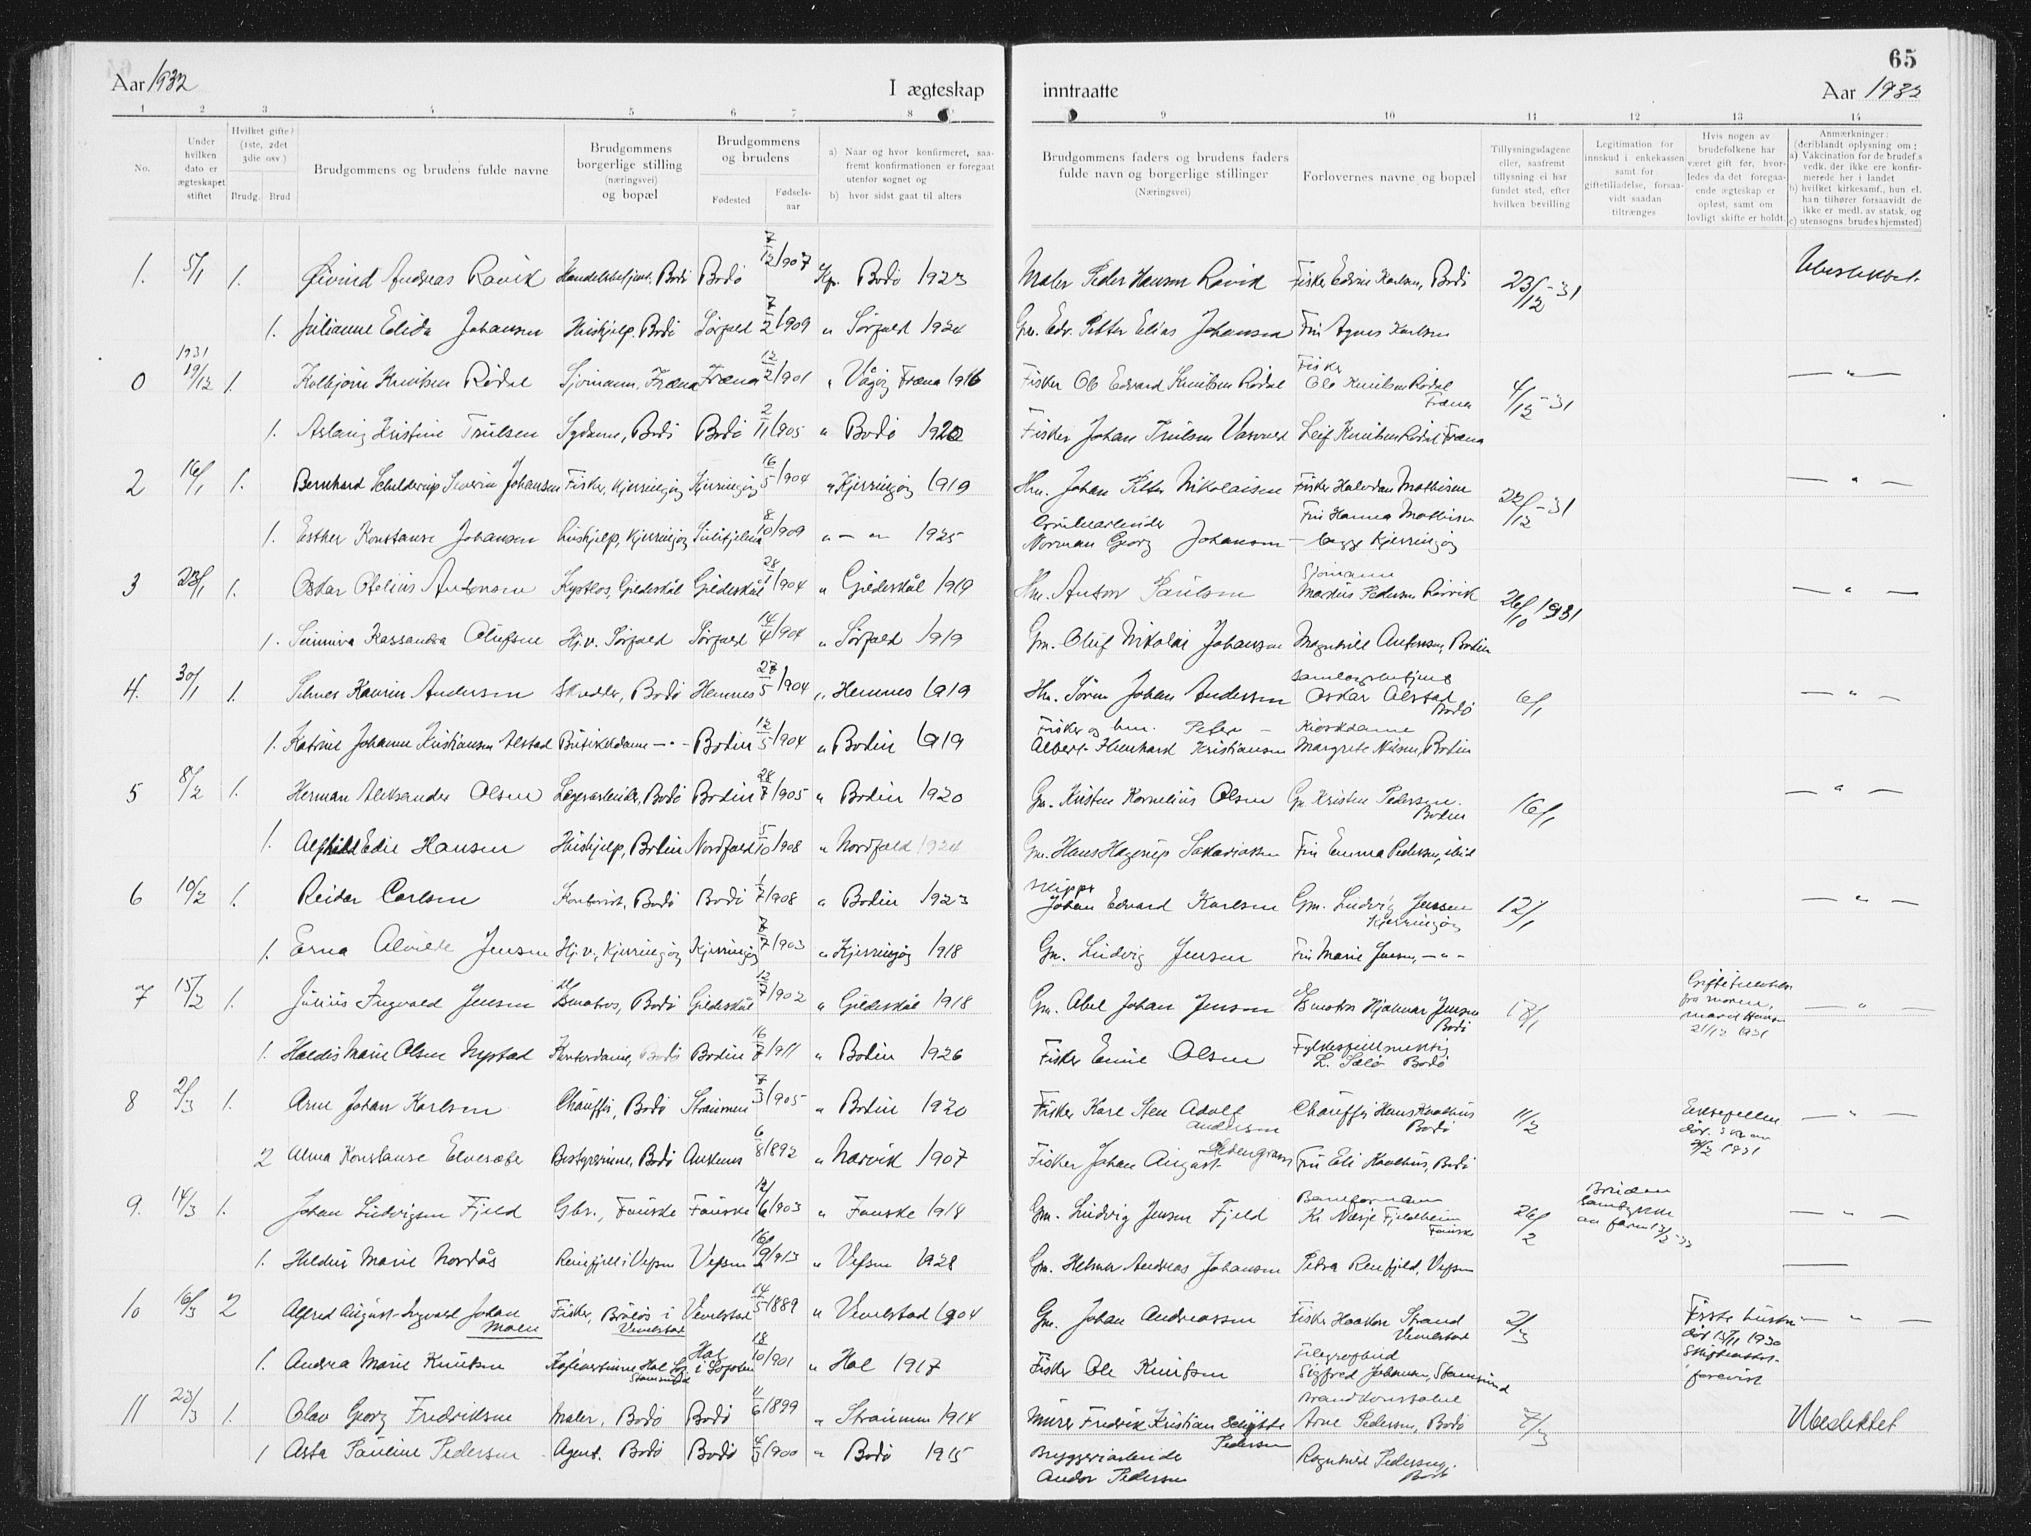 SAT, Ministerialprotokoller, klokkerbøker og fødselsregistre - Nordland, 801/L0036: Klokkerbok nr. 801C11, 1920-1934, s. 65